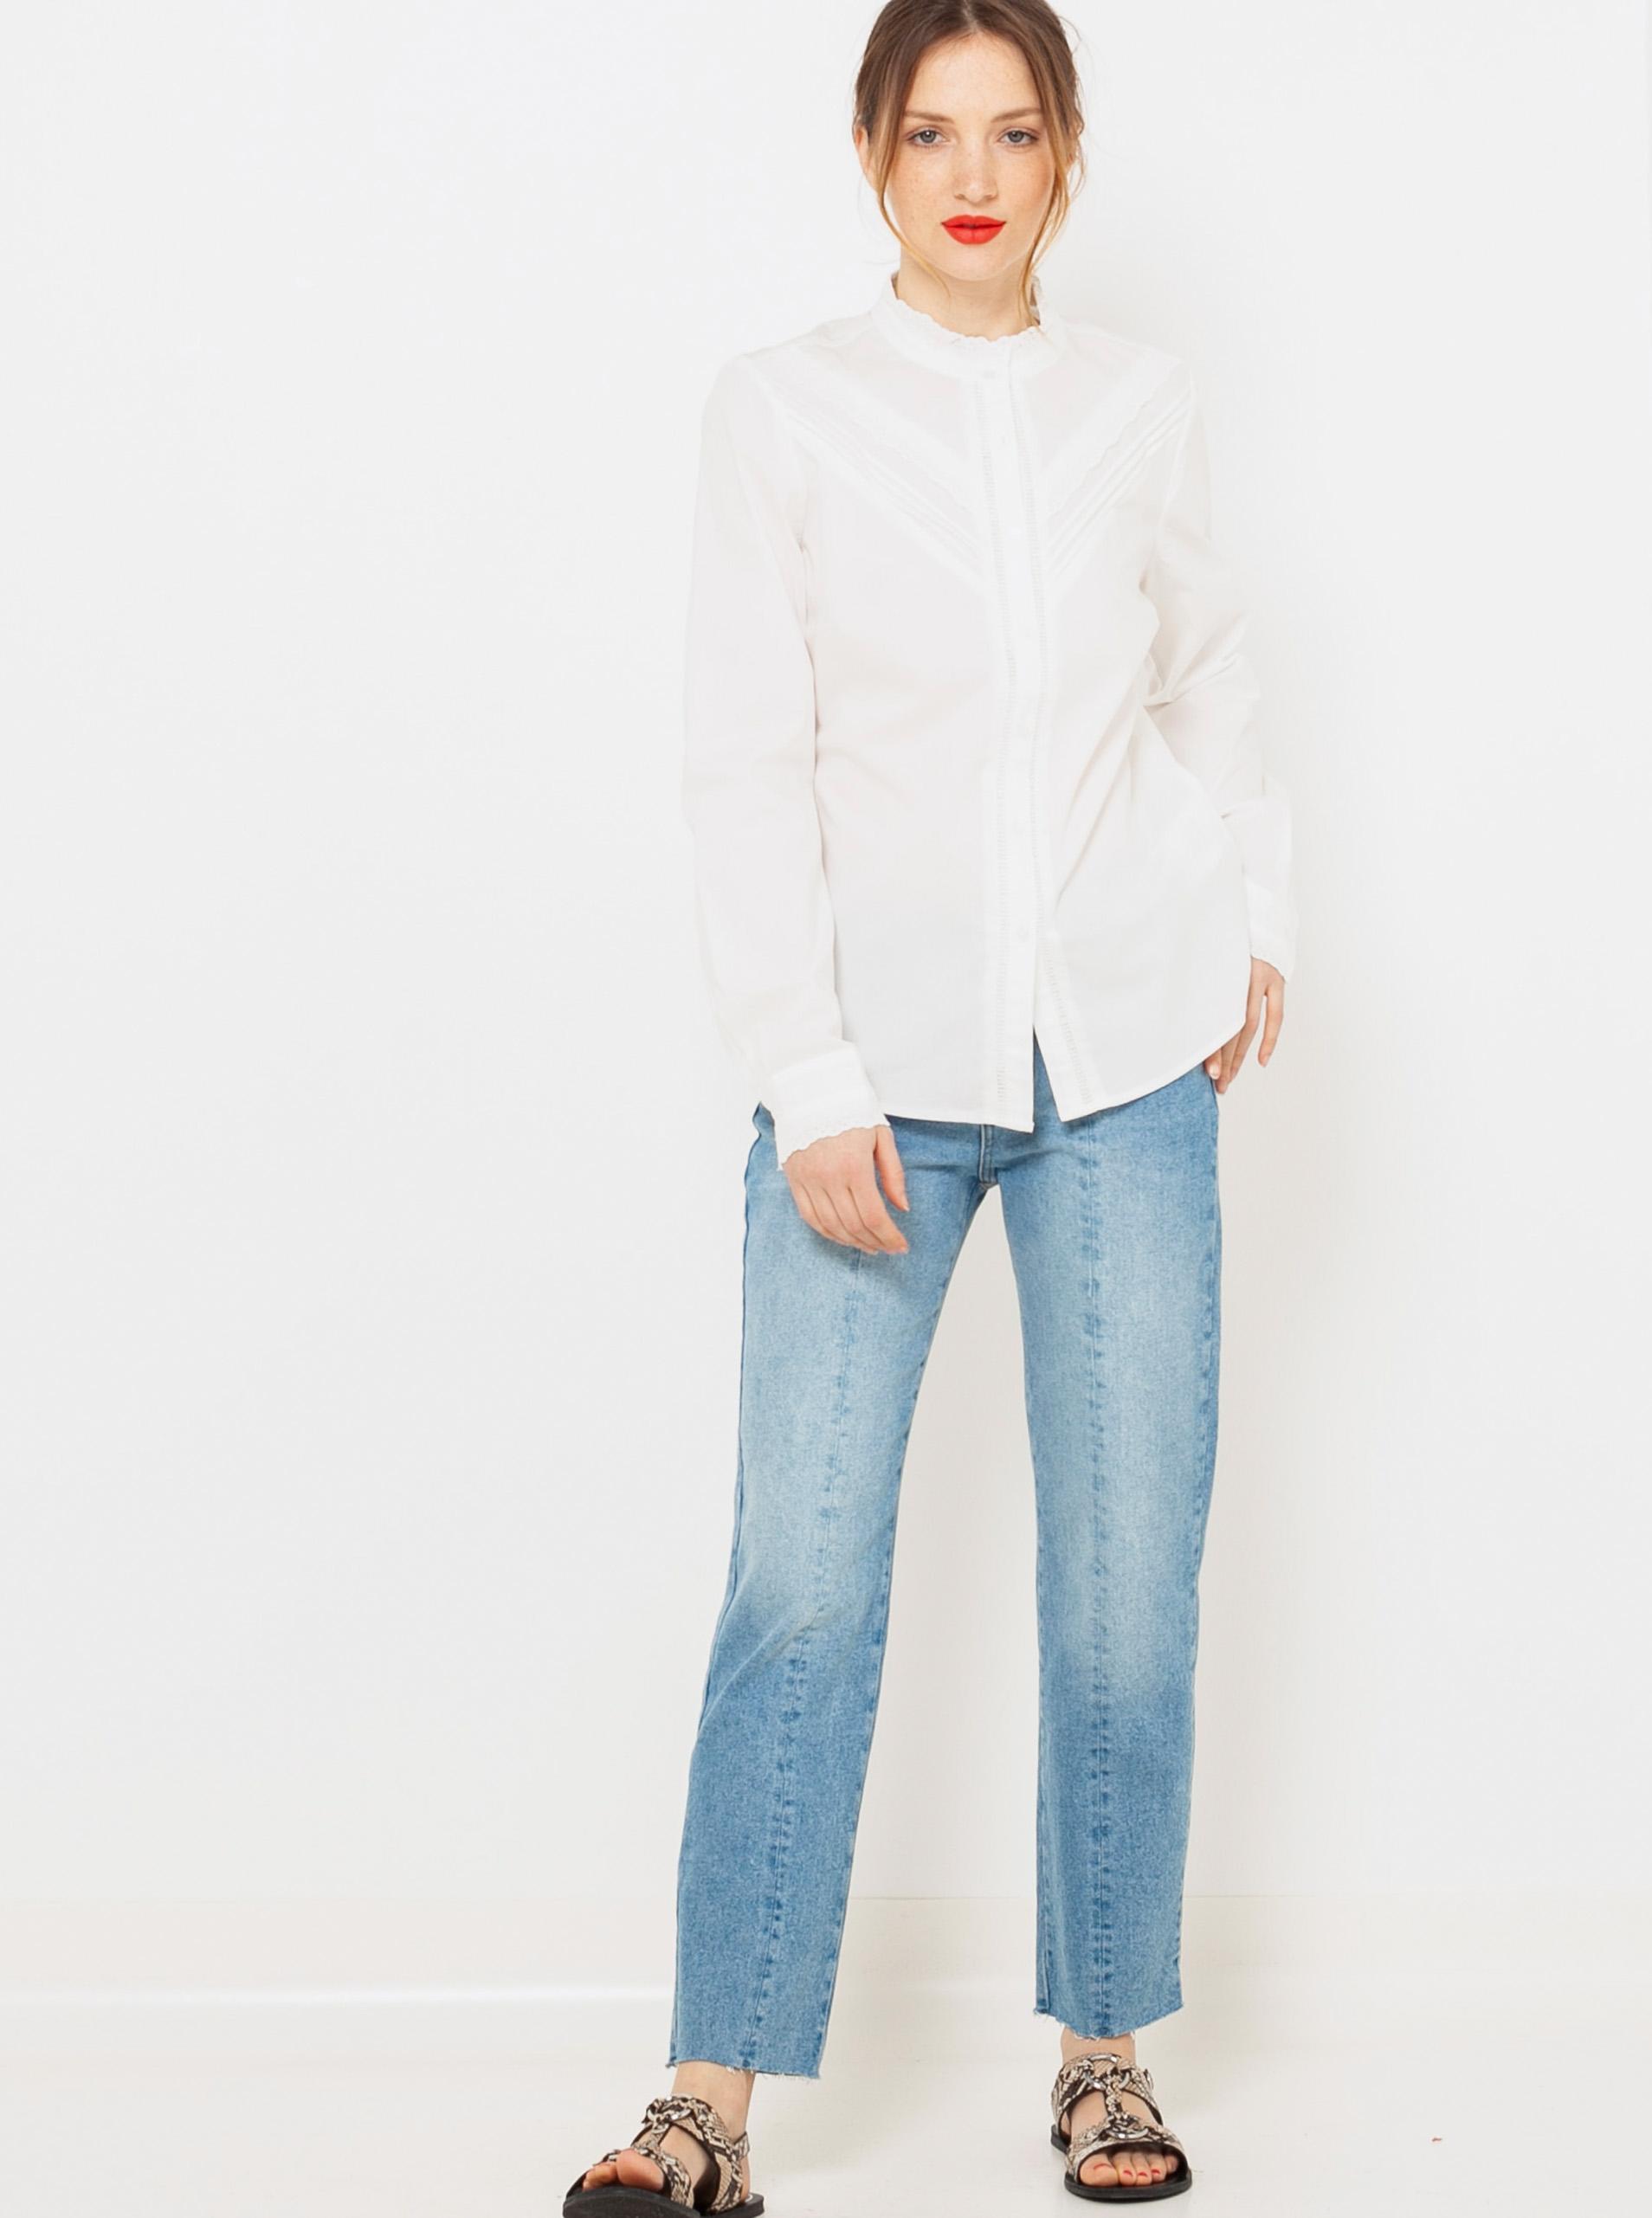 CAMAIEU white blouse